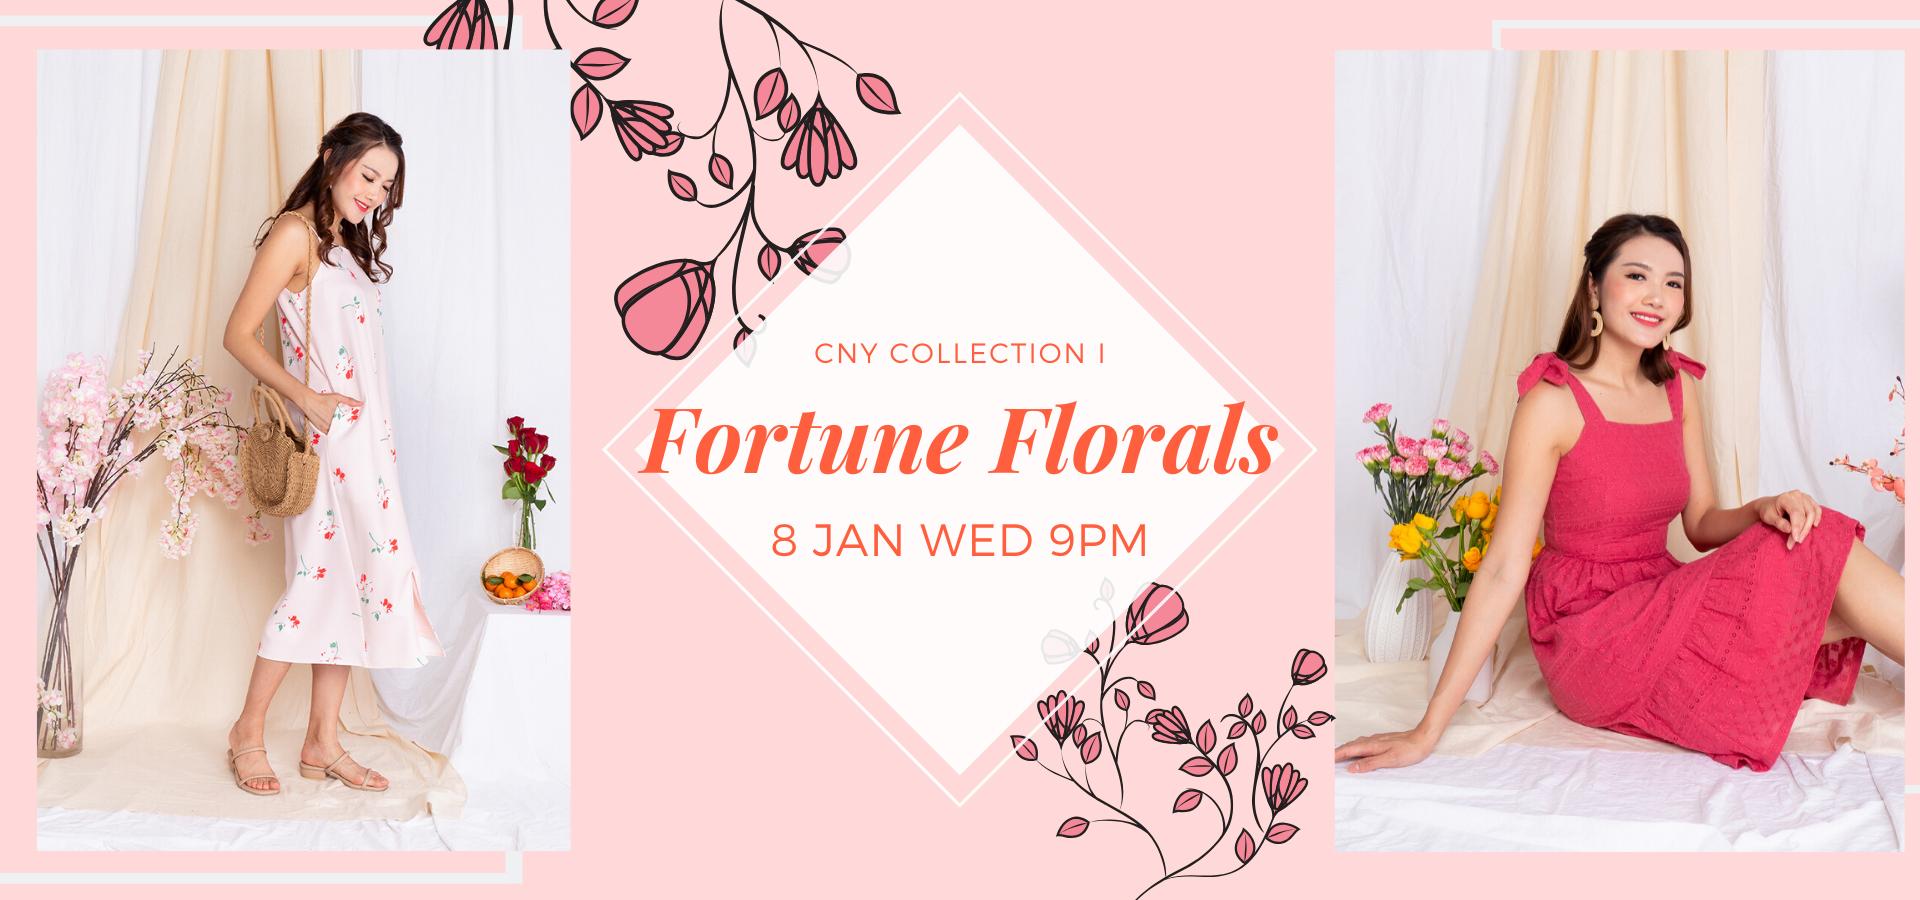 Fortune Florals